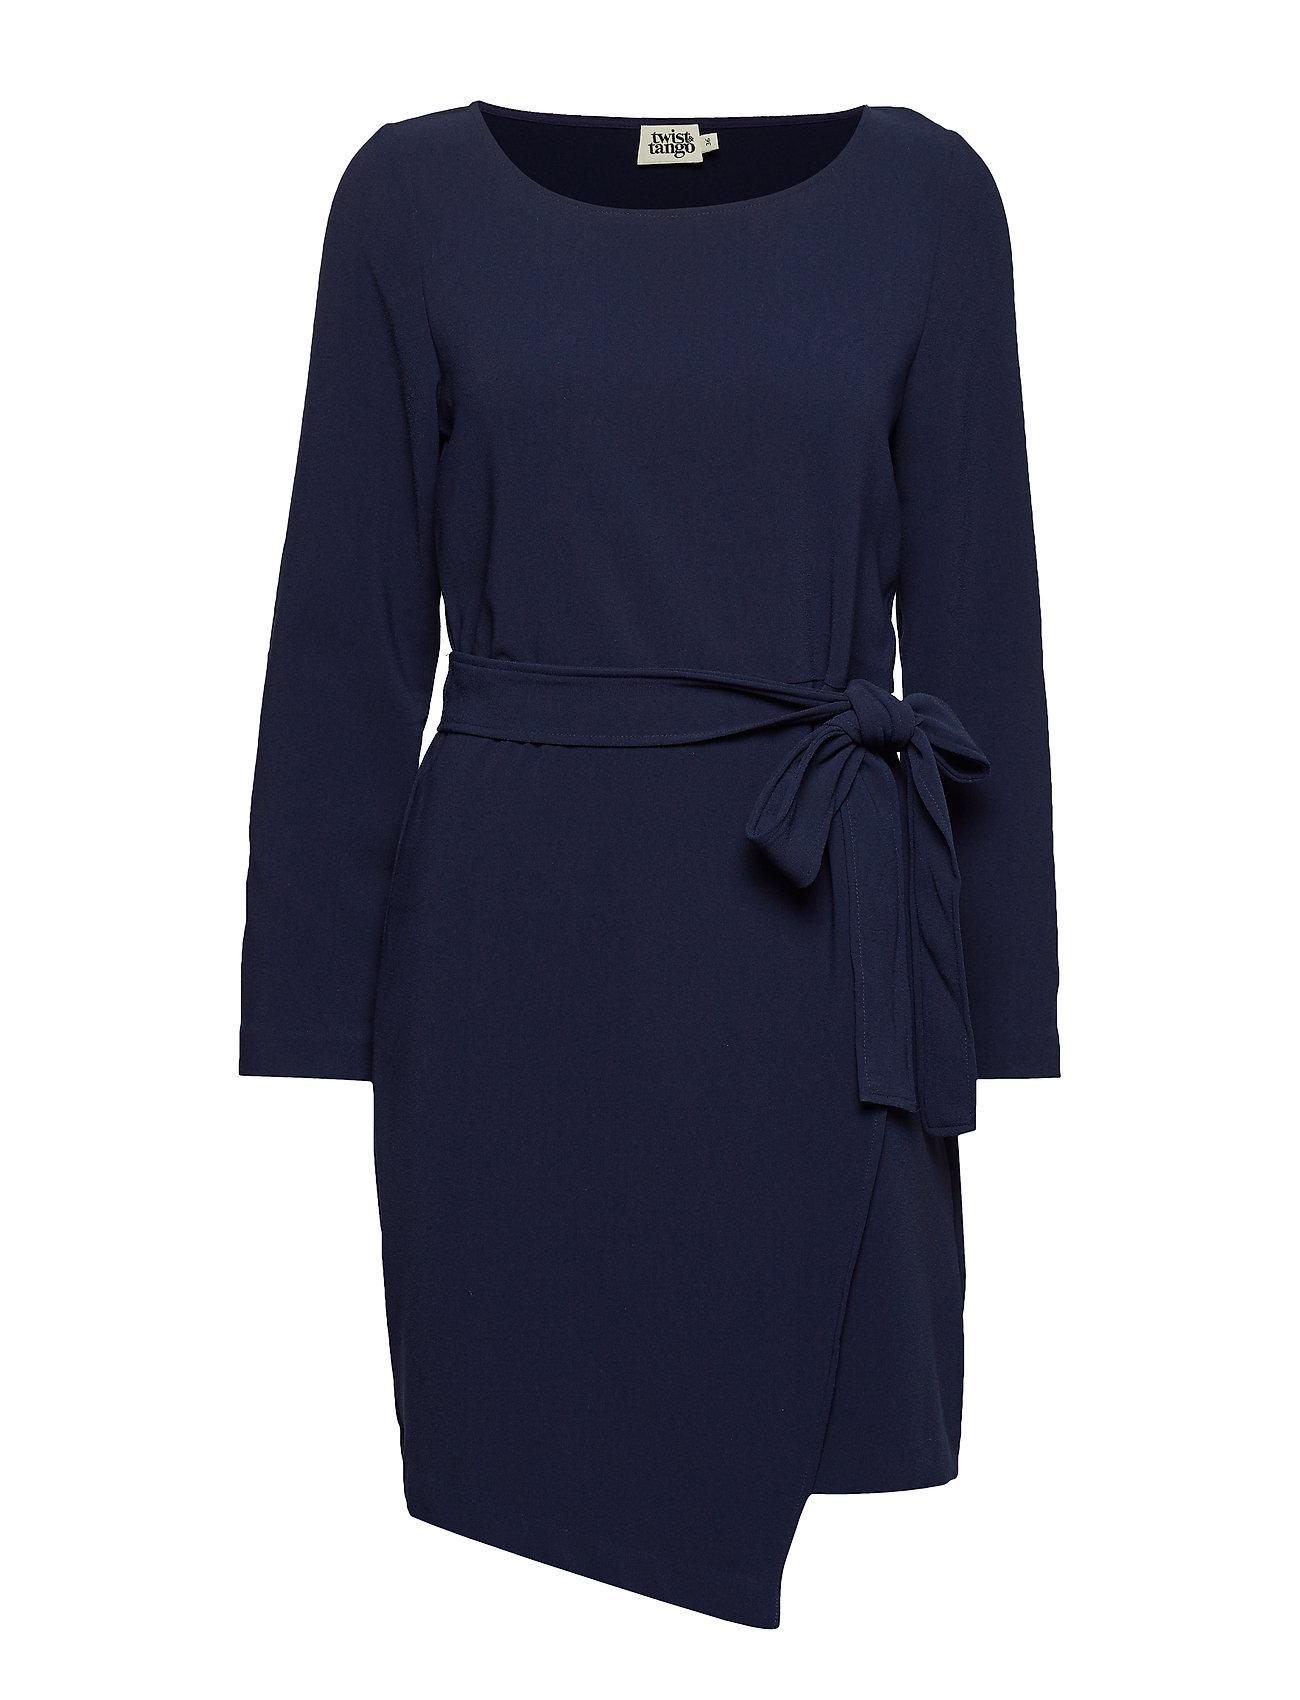 Twist & Tango Adele Dress Blackish Blue - BLACKISH BLUE